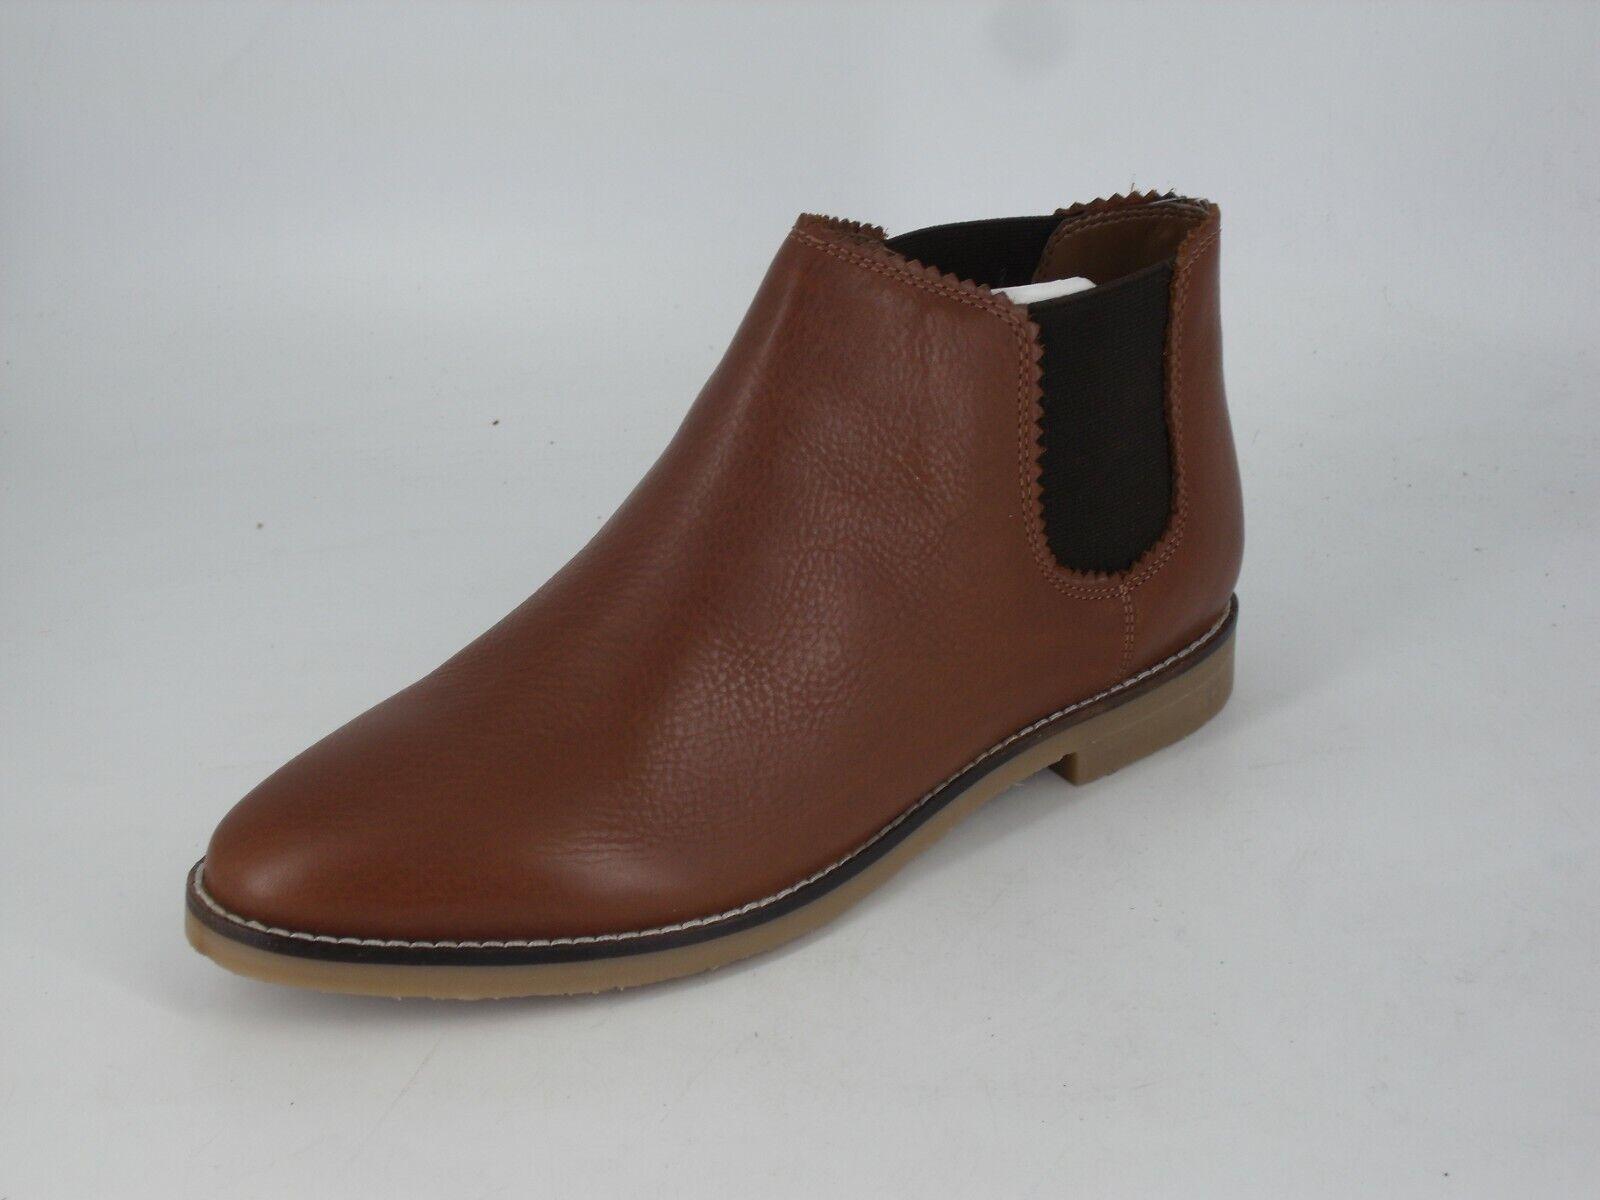 White Stuff Faye Flat Chelsea Boot Tan Size UK 6 EU 39 NH10 84